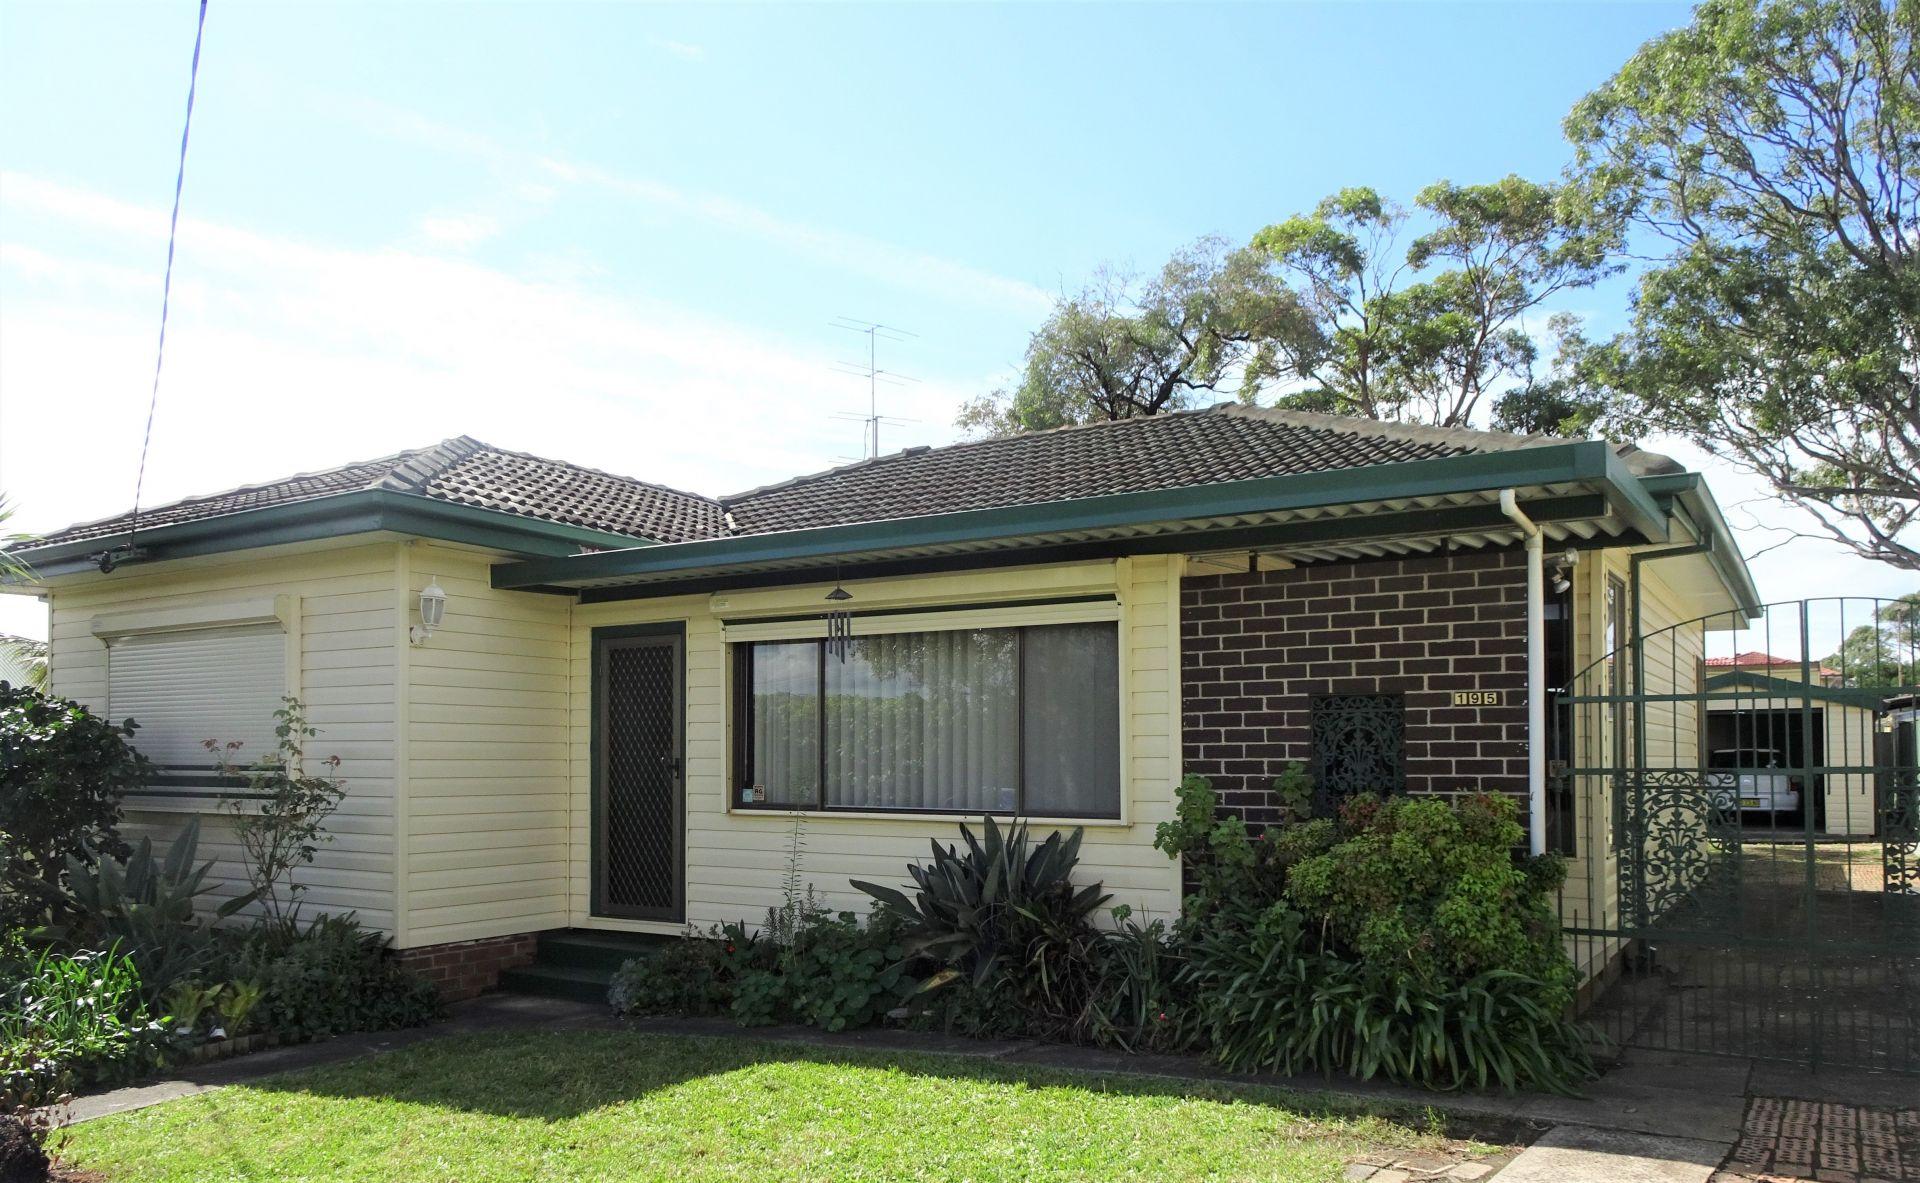 BARRACK HEIGHTS, NSW 2528